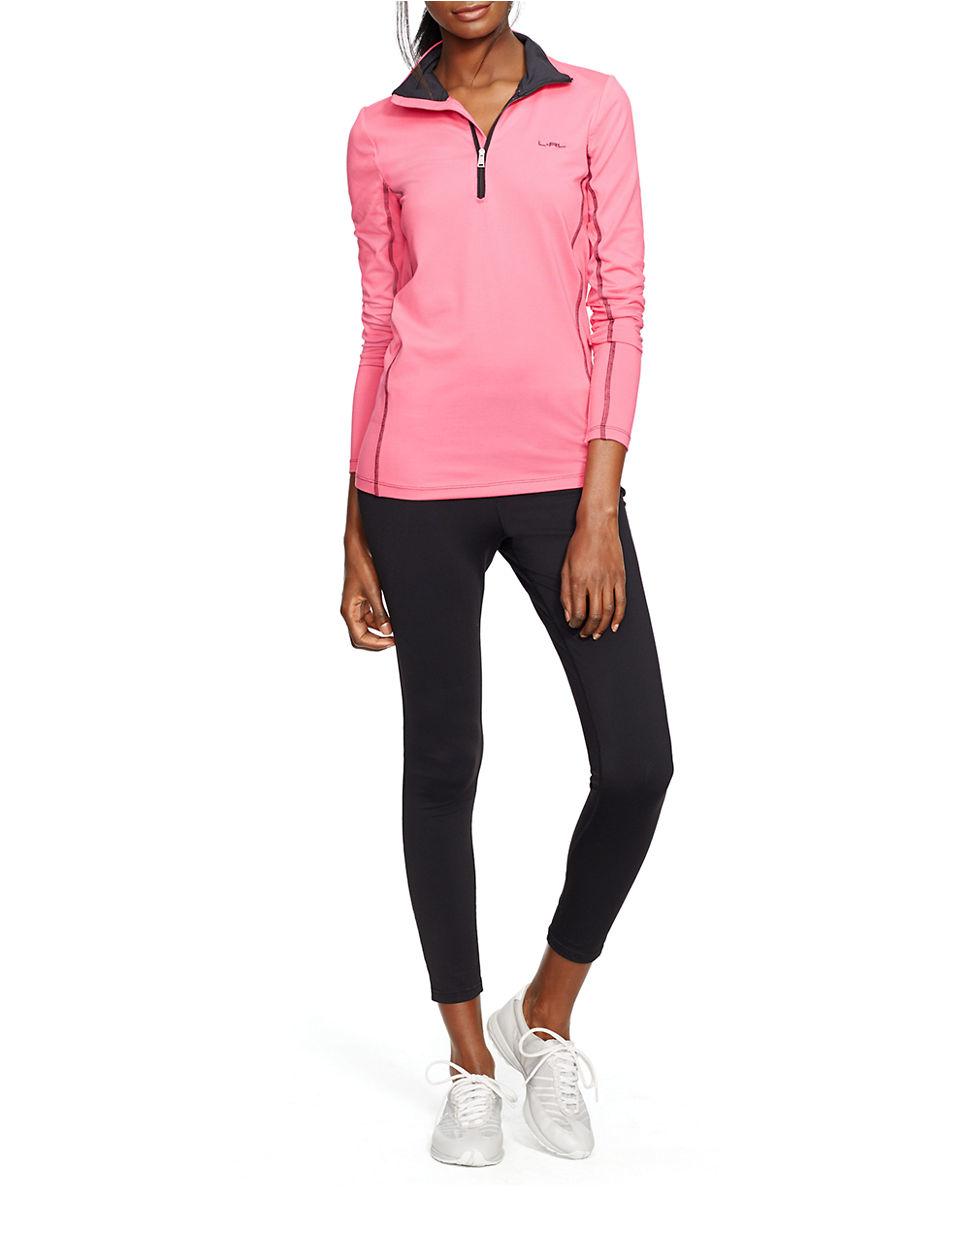 lauren by ralph lauren jersey mockneck pullover in pink lyst. Black Bedroom Furniture Sets. Home Design Ideas